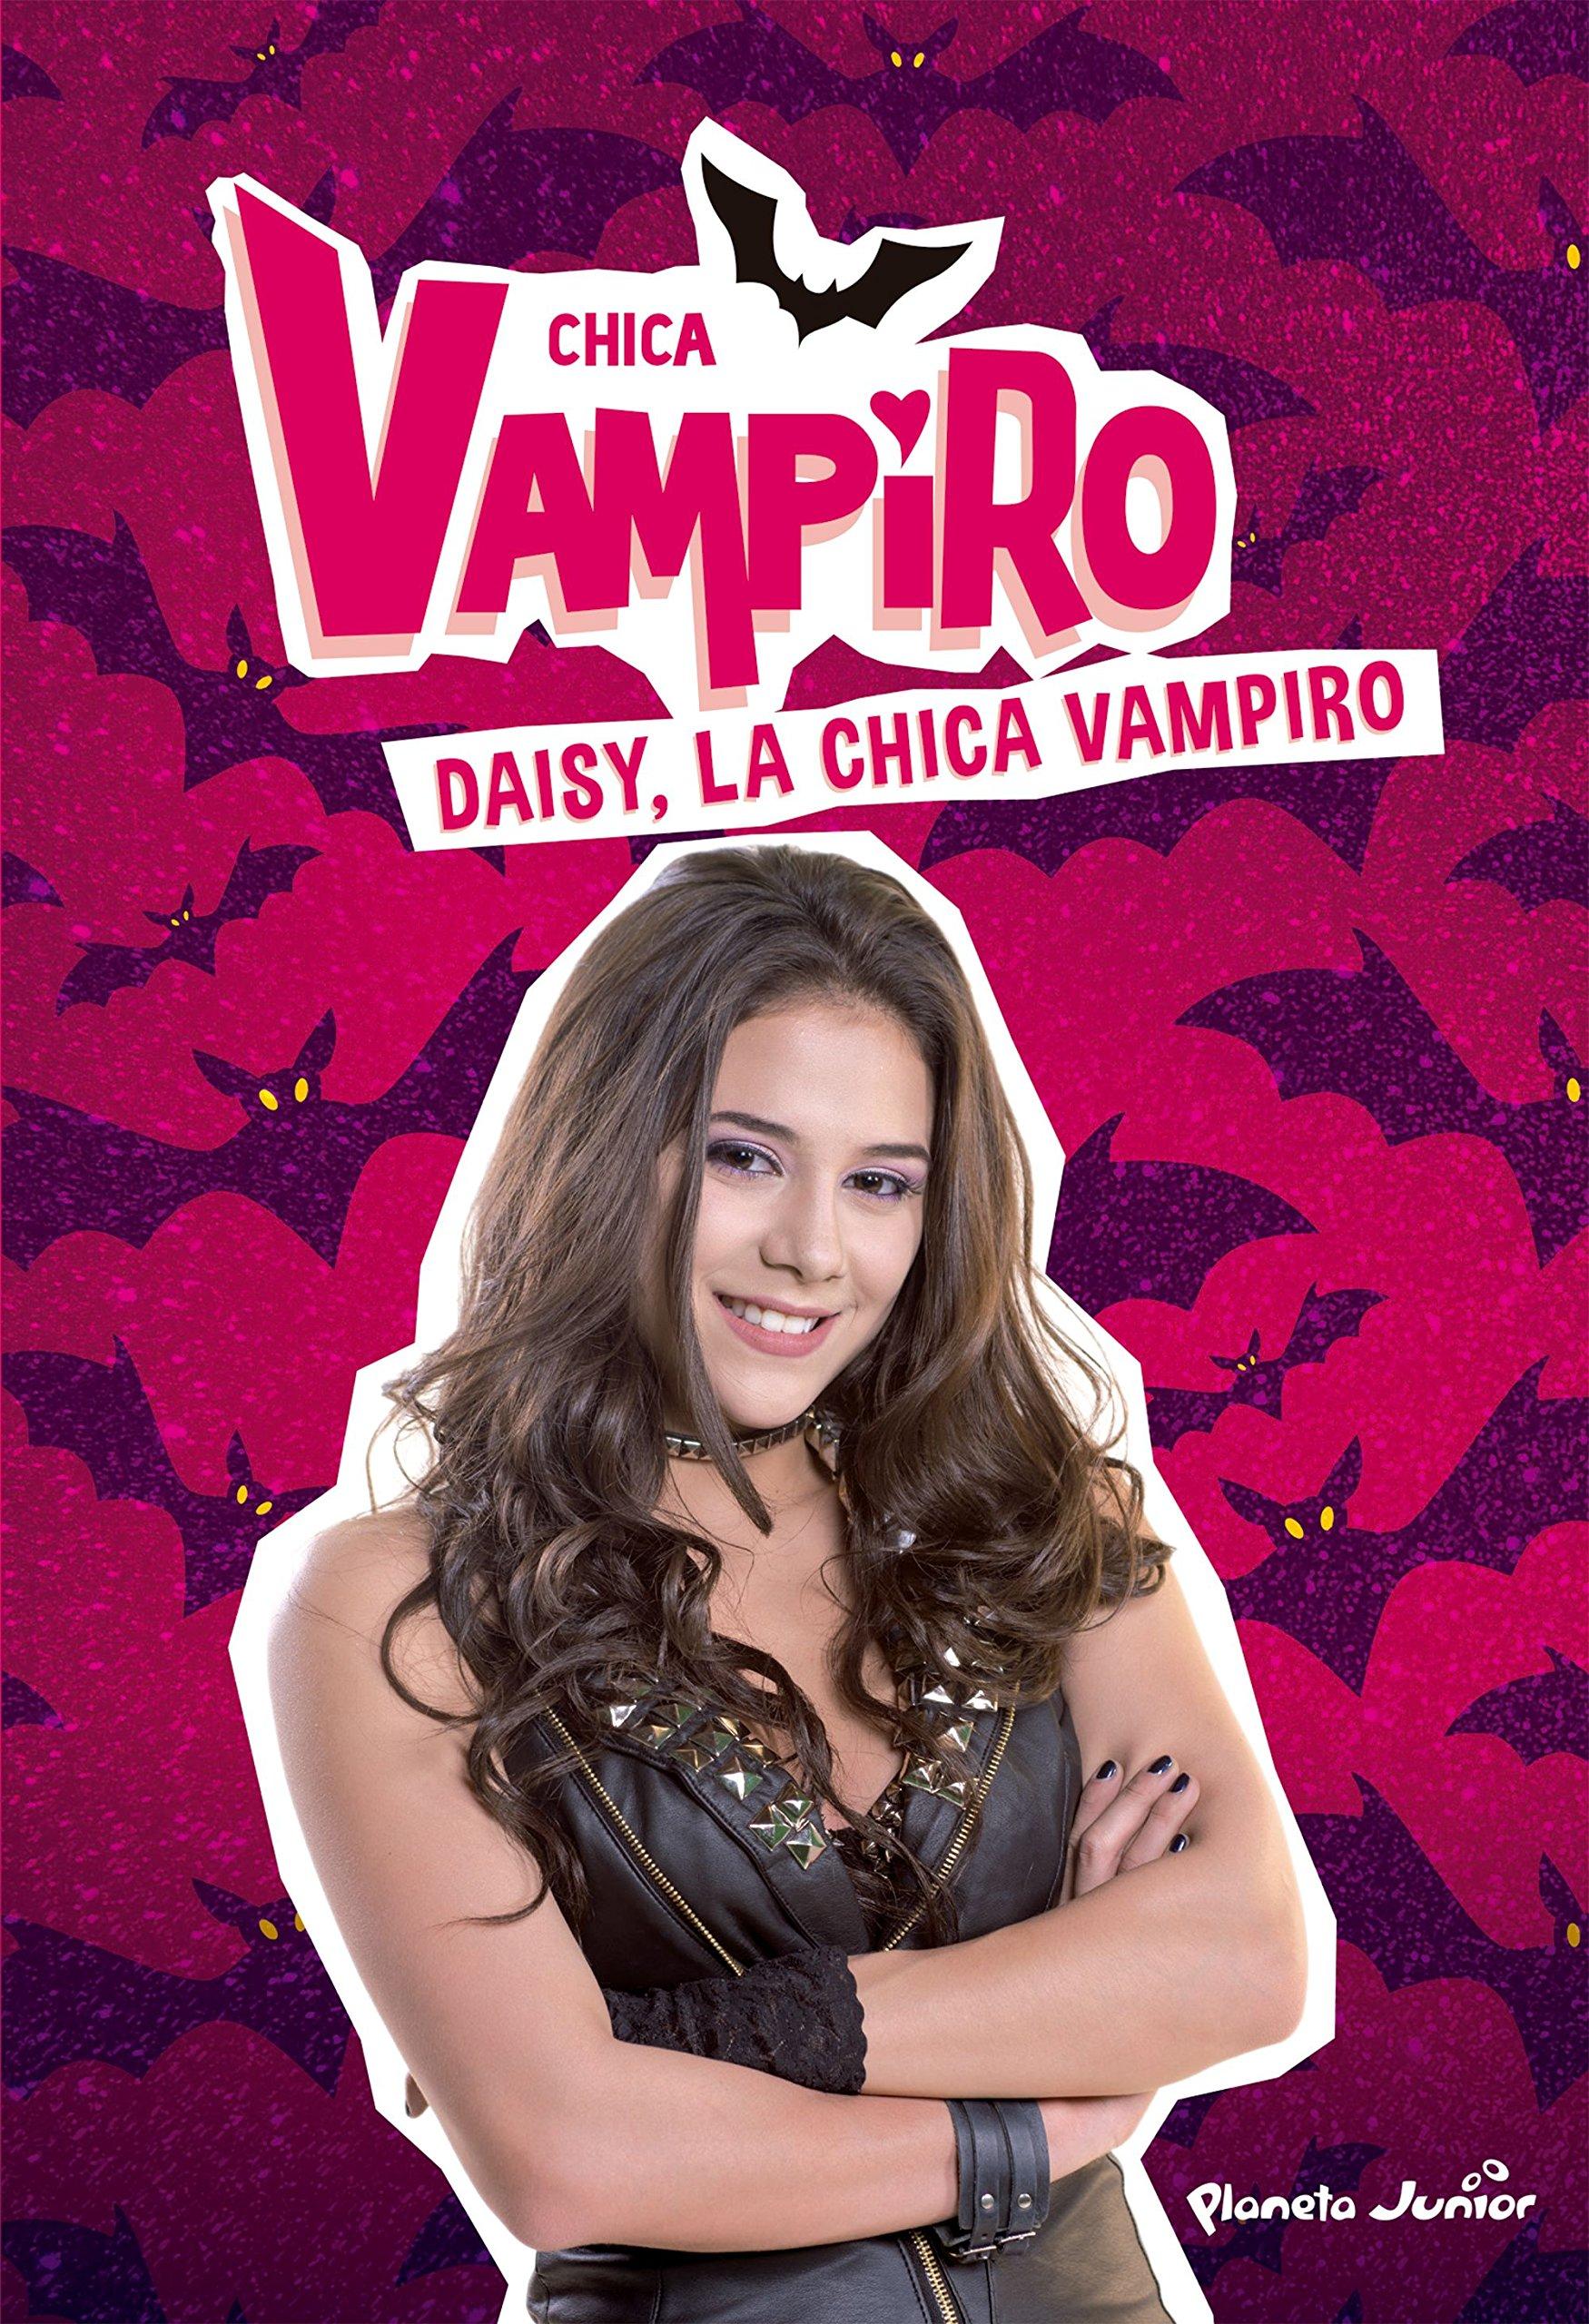 catch size 40 details for Chica Vampiro. Daisy, la chica vampiro: Chica Vampiro ...